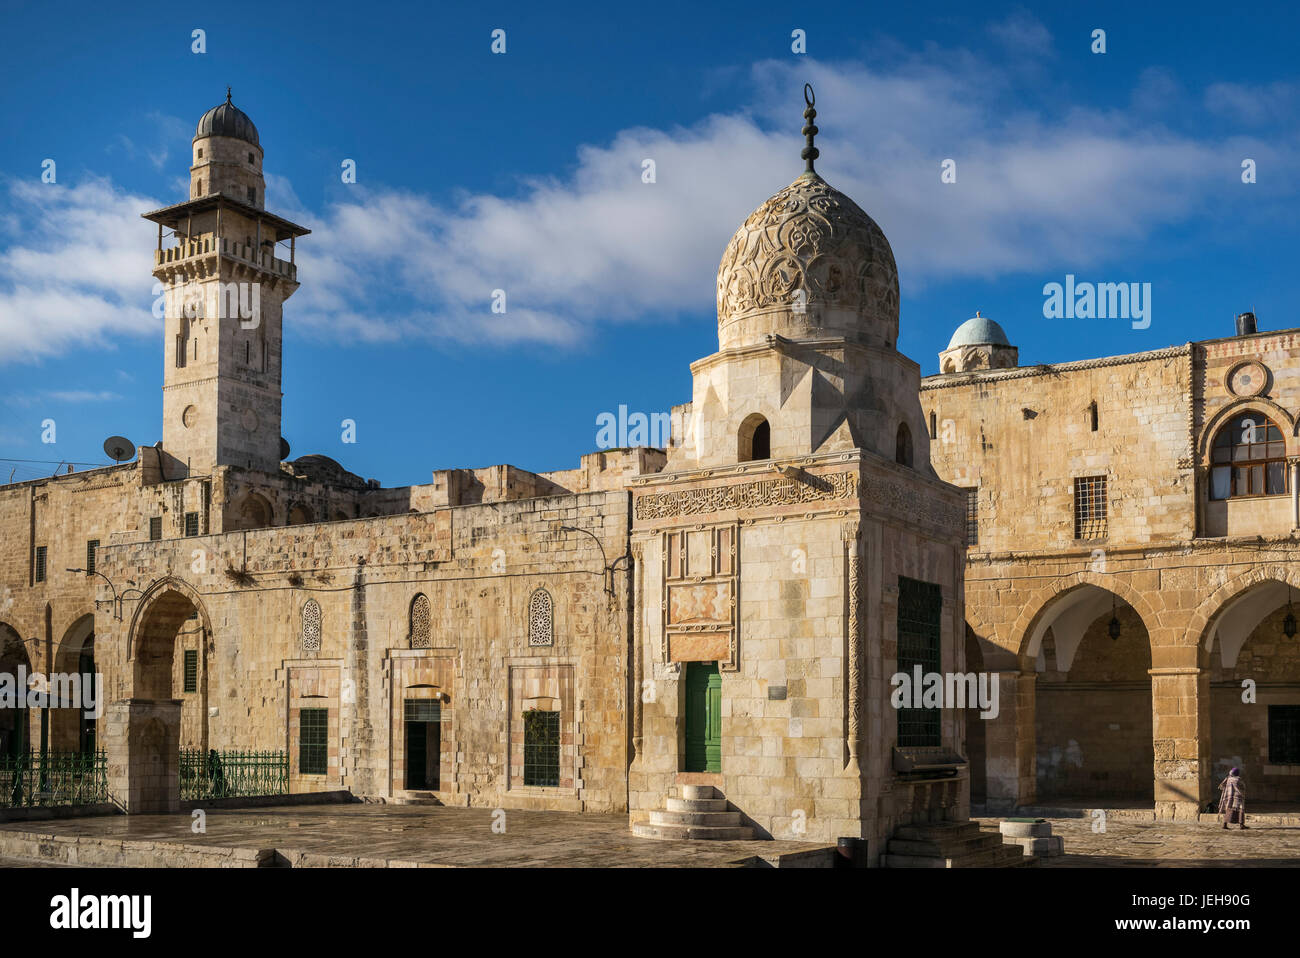 Temple Mount, Old City of Jerusalem; Jerusalem, Israel - Stock Image